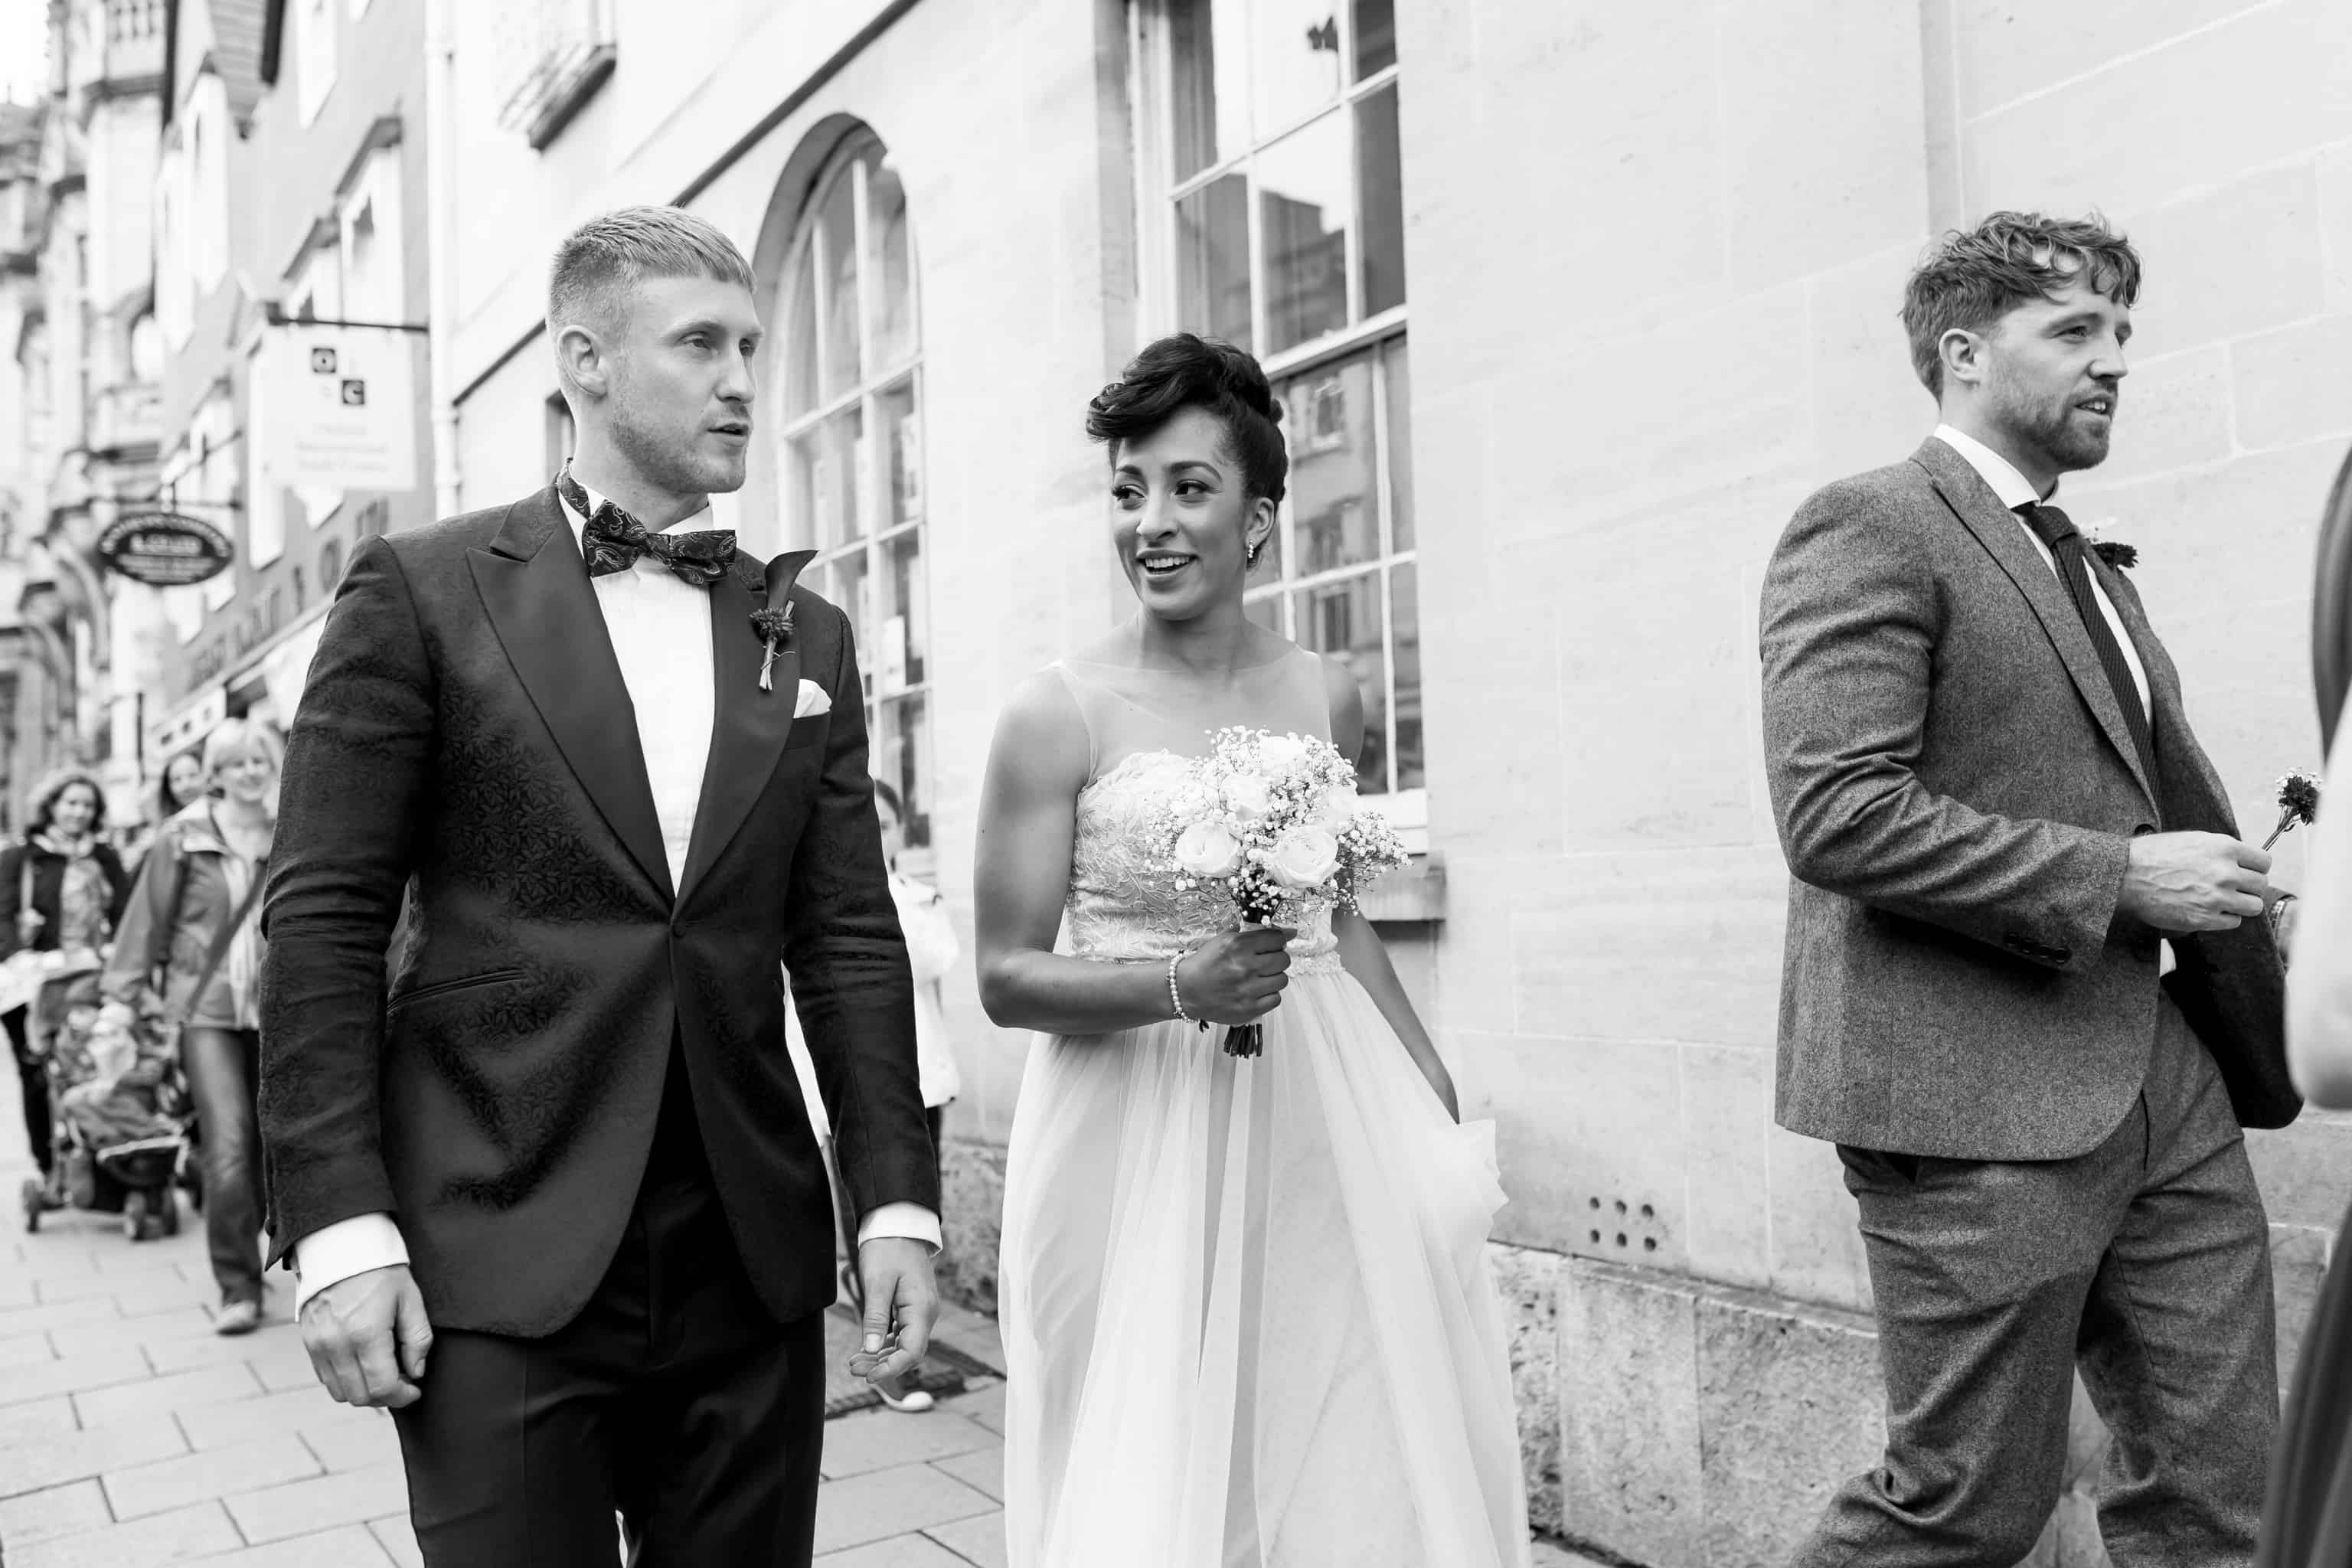 Stunning Couple - Beautiful Bridal Makeup By Miss Diamond @ Gemma Sutton